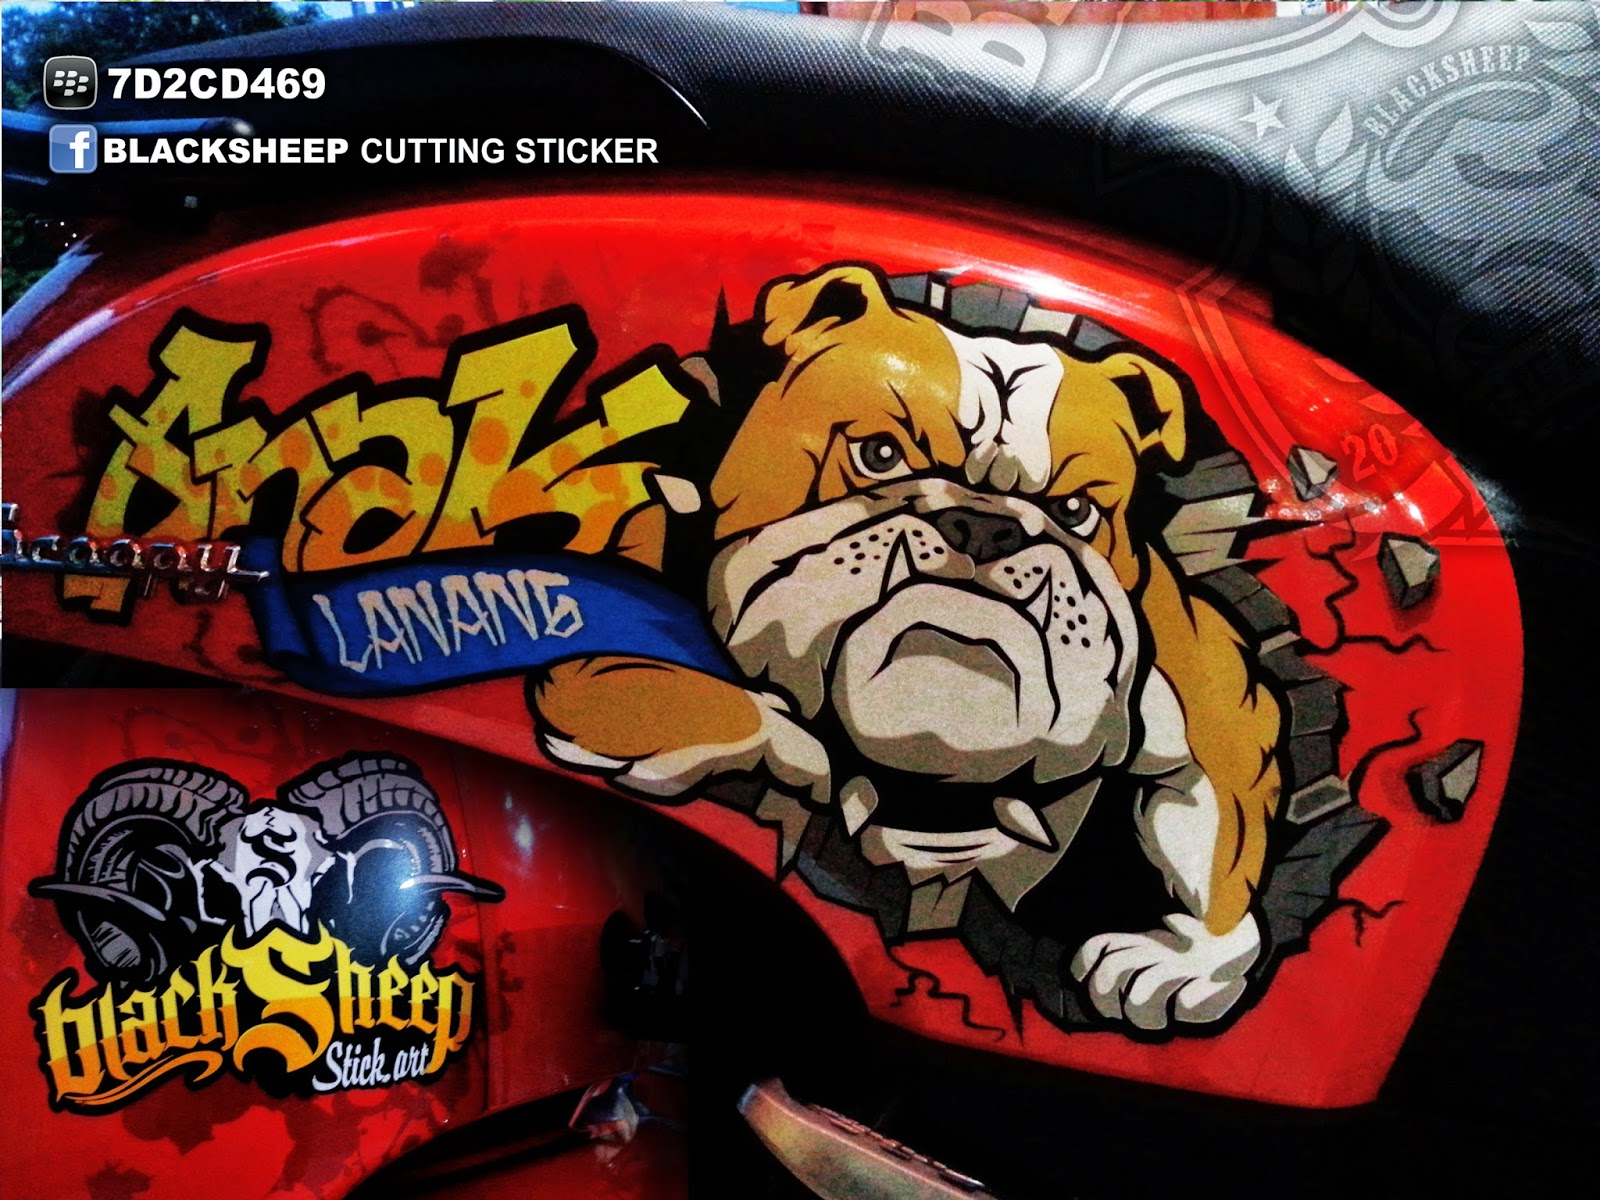 sticker bulldog scoopy cutting sticker